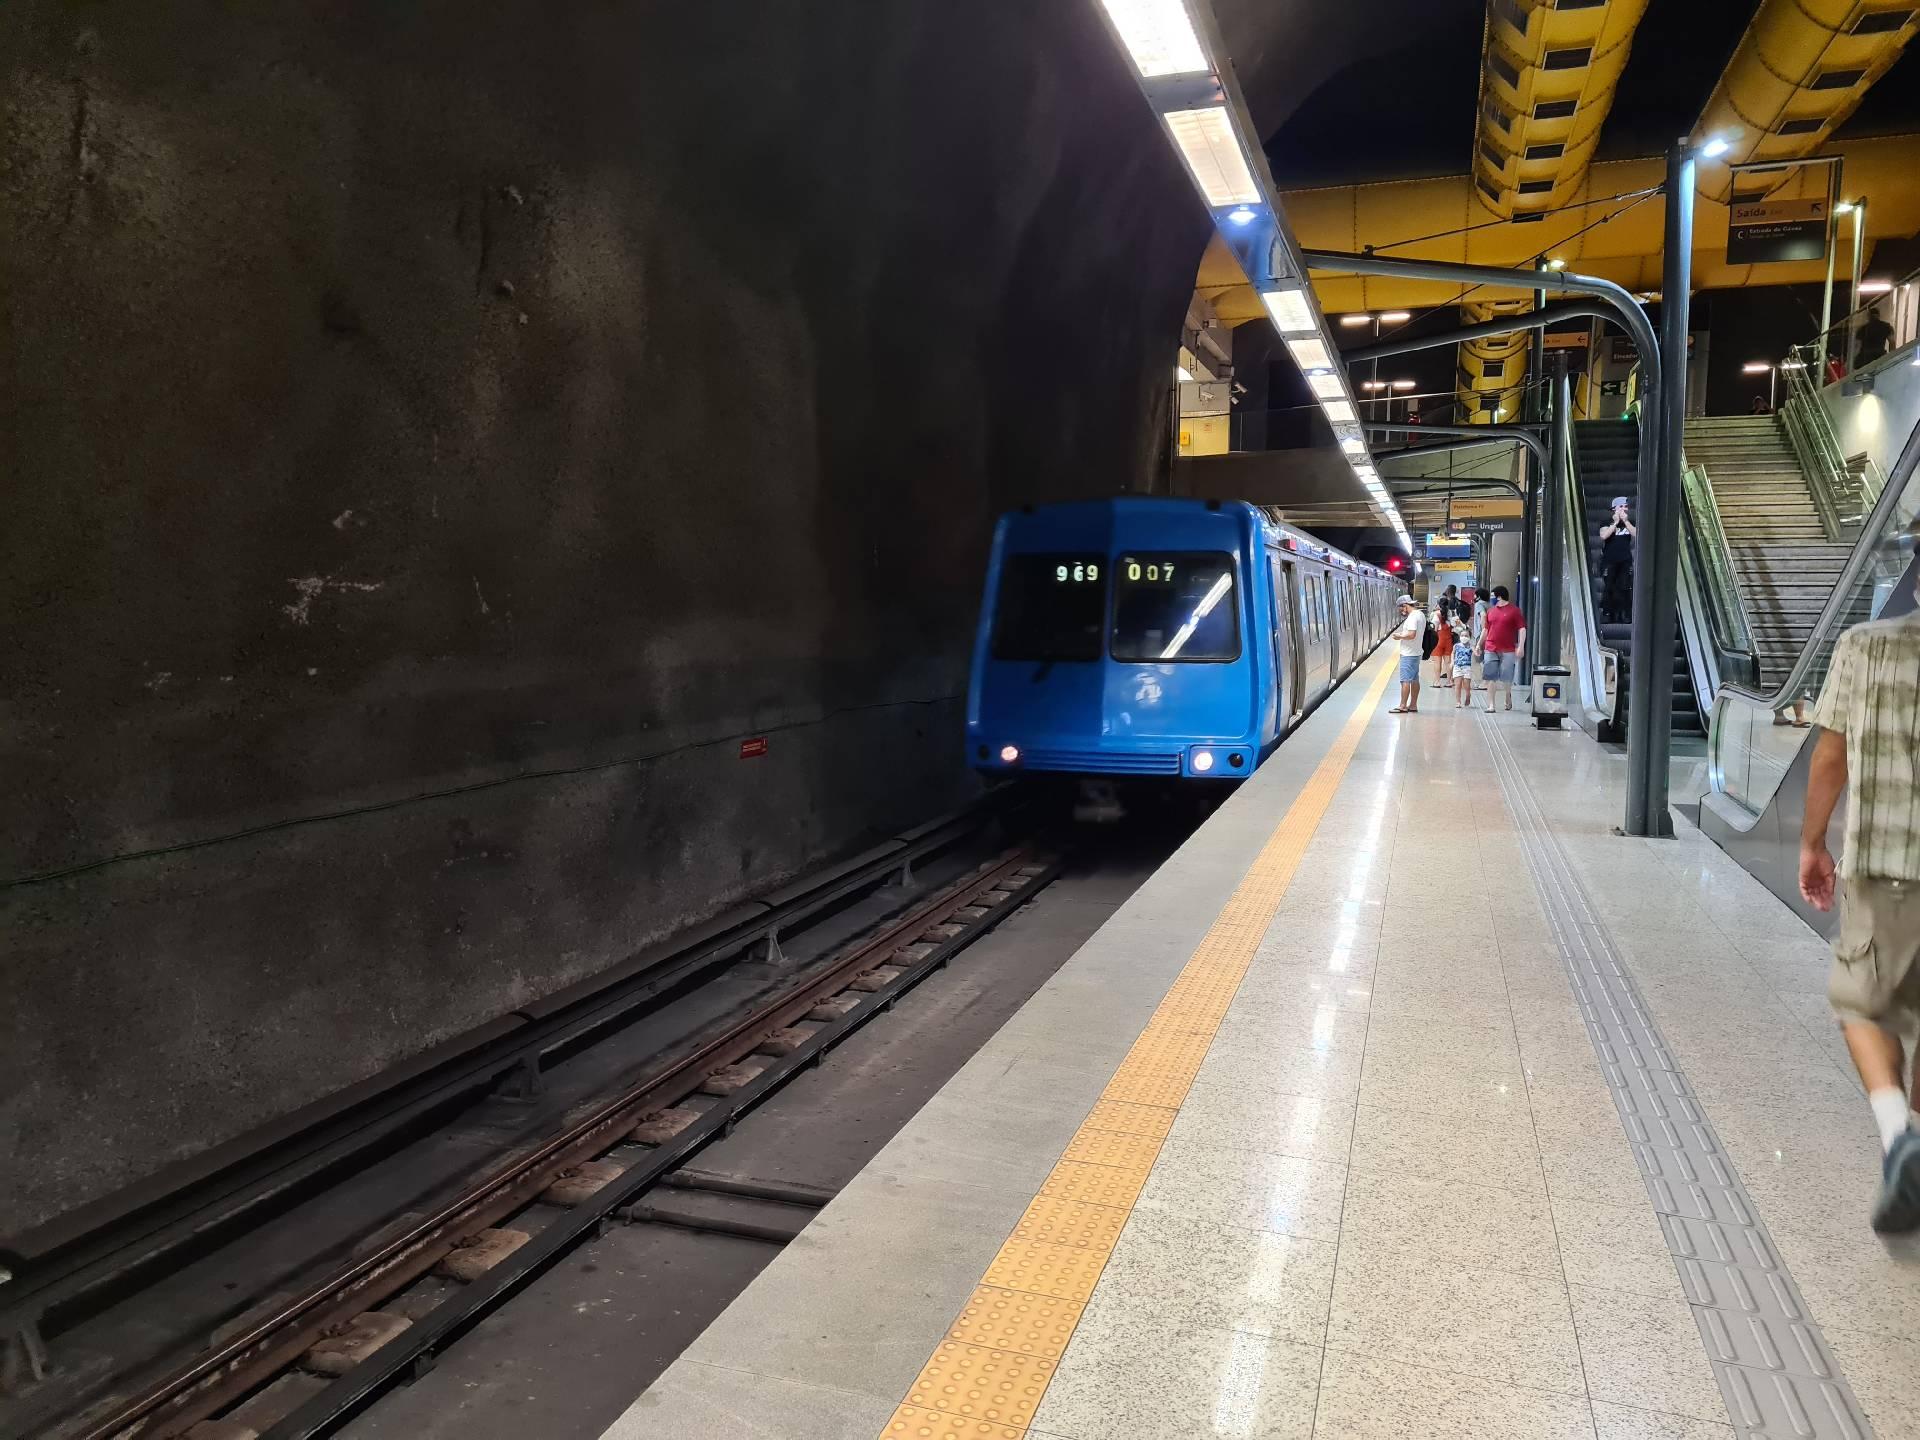 в метро Рио-де-Жанейро